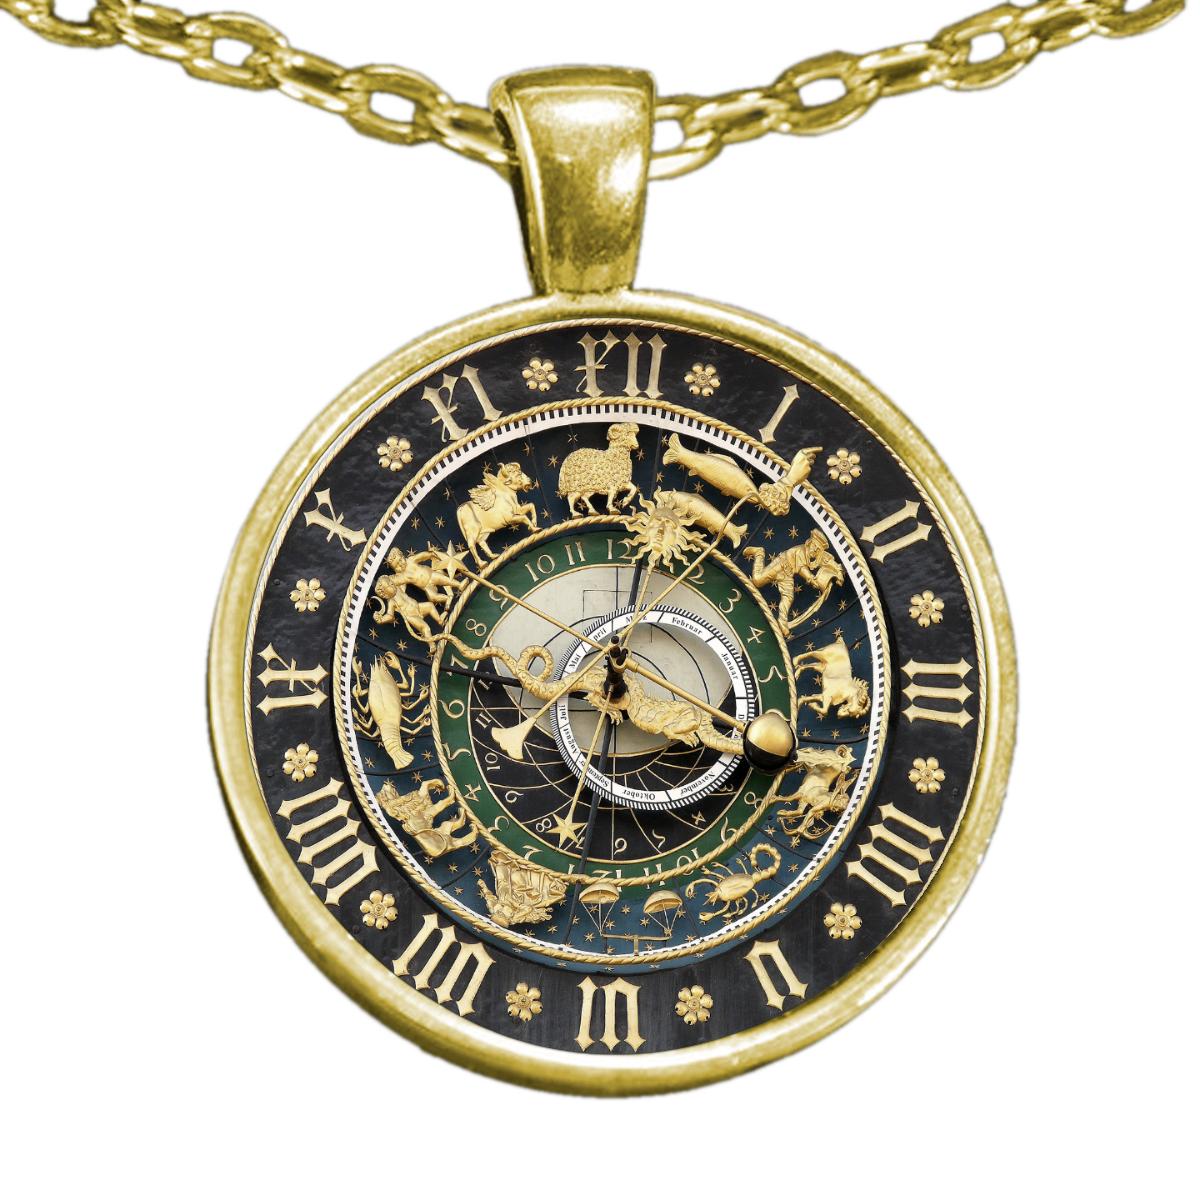 Ulm Astronomical Clock Necklace